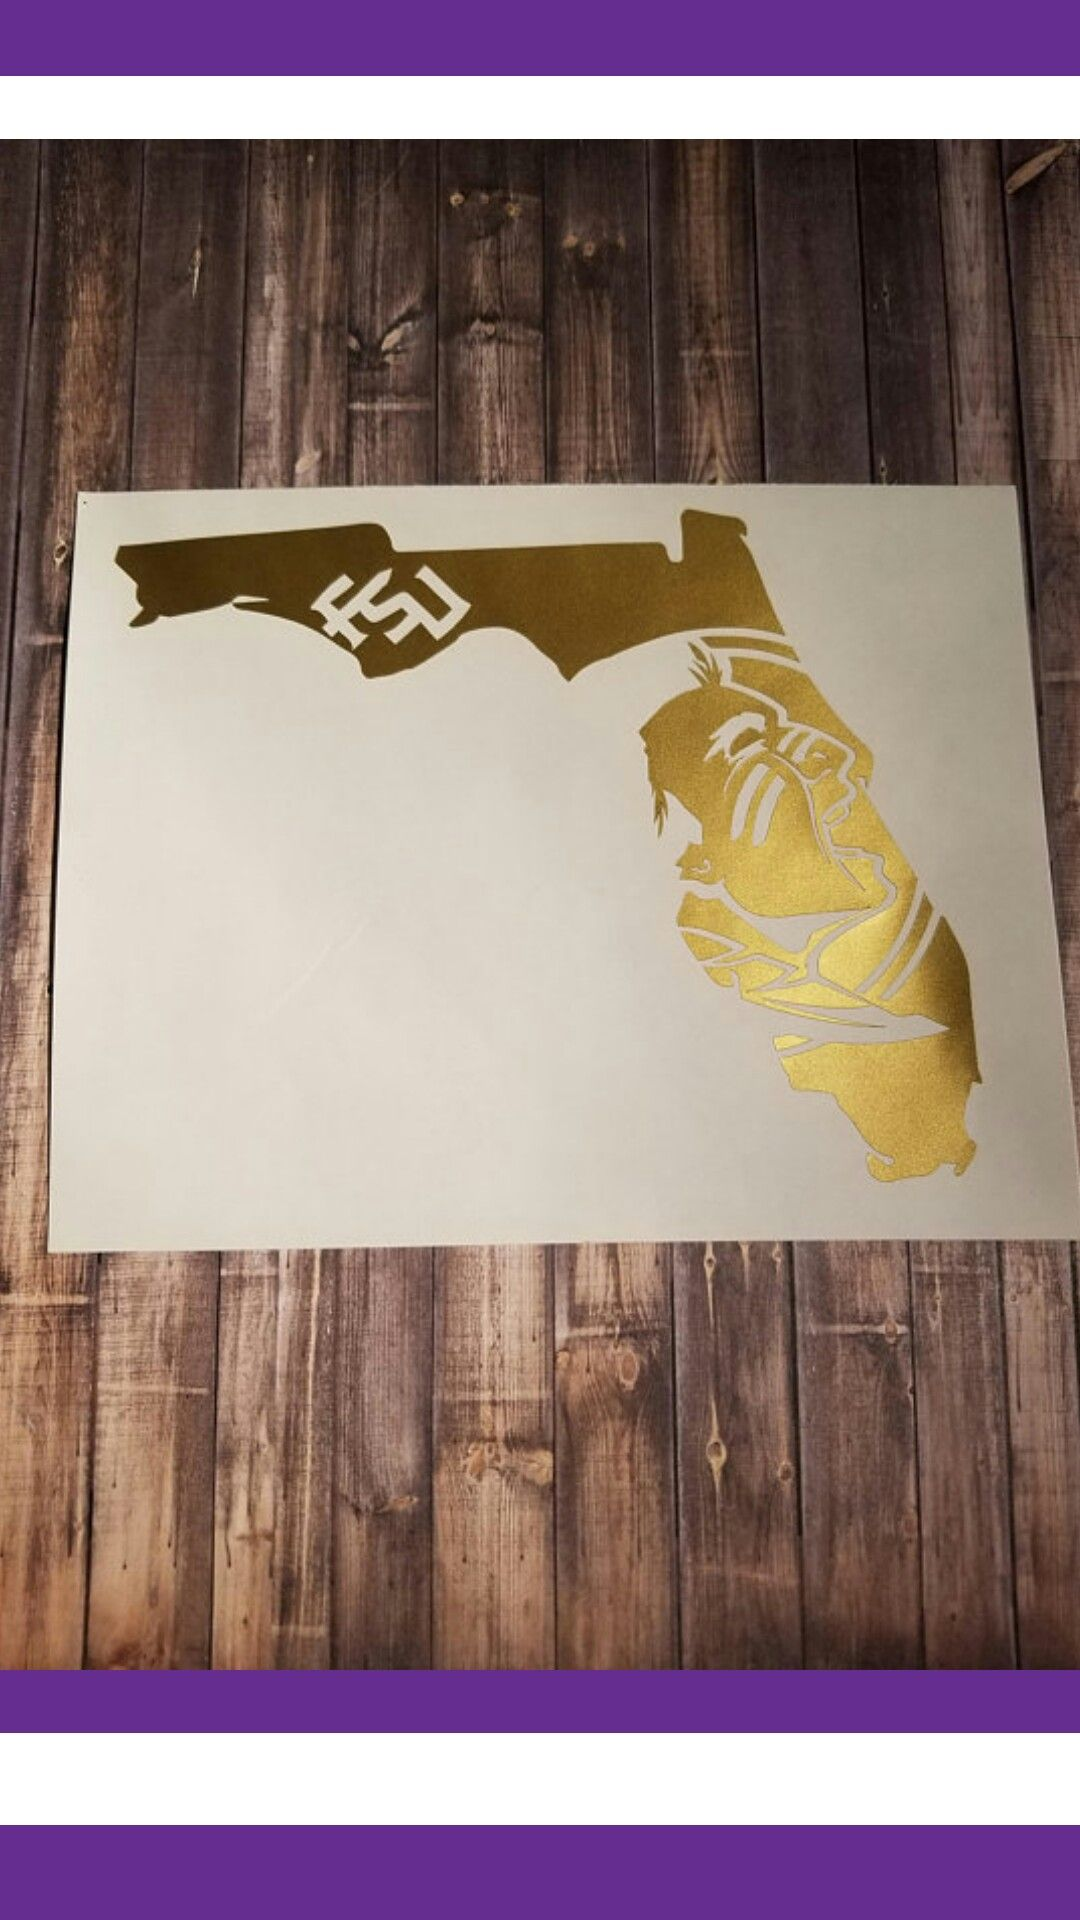 Fsu Seminoles Decal Florida State University Car Decal Laptop Decal Yeti Decal Seminoles Football Ad [ 1920 x 1080 Pixel ]